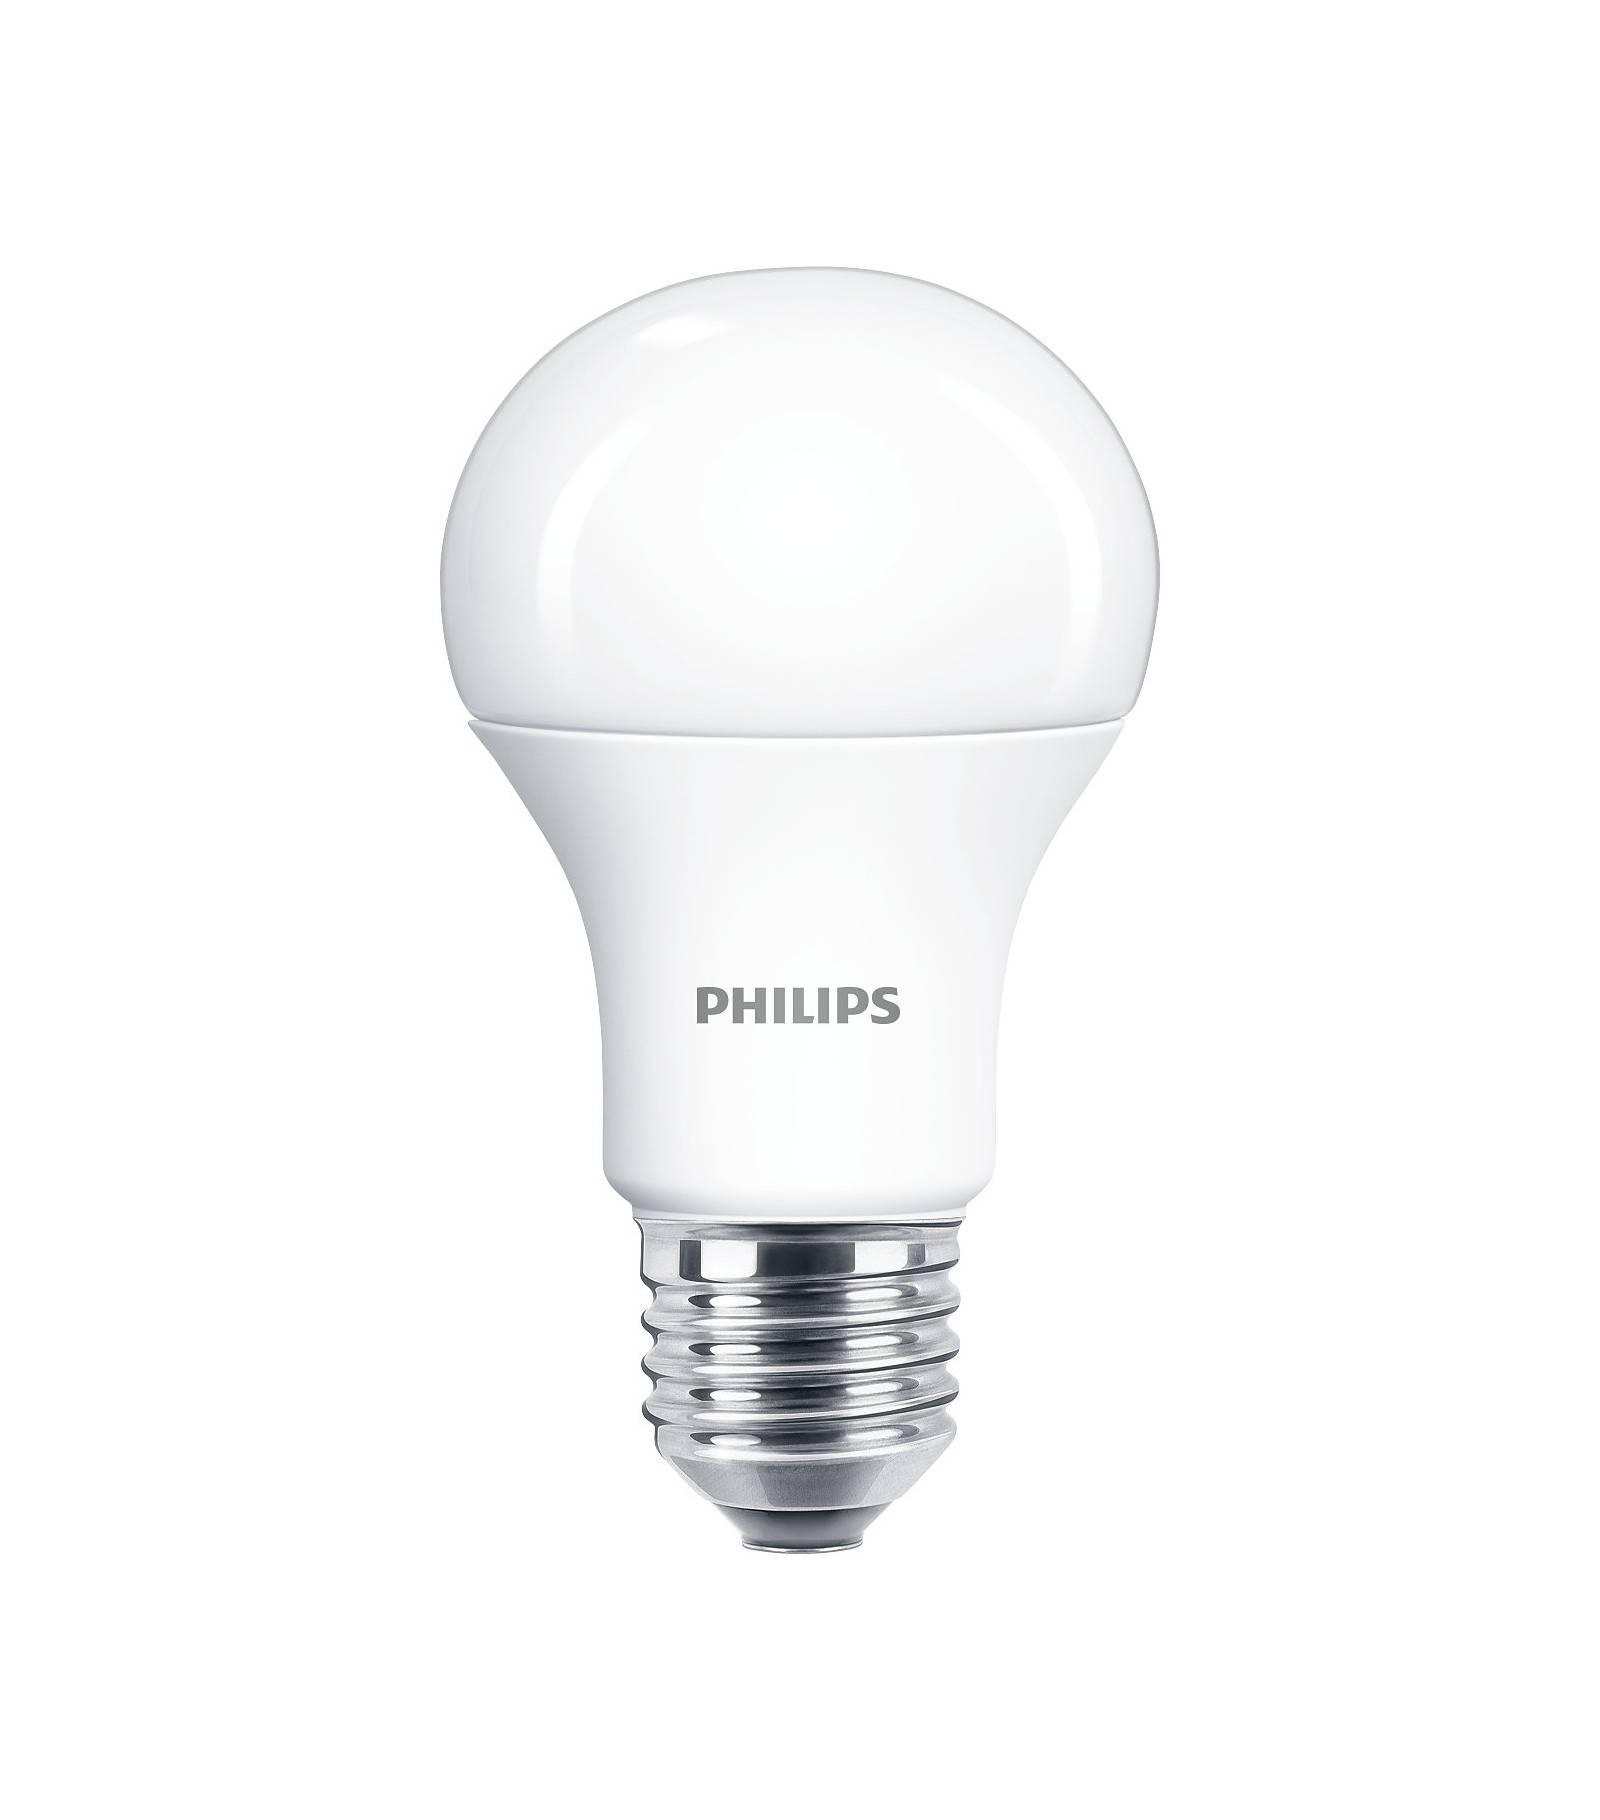 master led bulb dt puissance 9w qui 60w e27 dimmable 806lm a60 fr philips ampoule e27. Black Bedroom Furniture Sets. Home Design Ideas